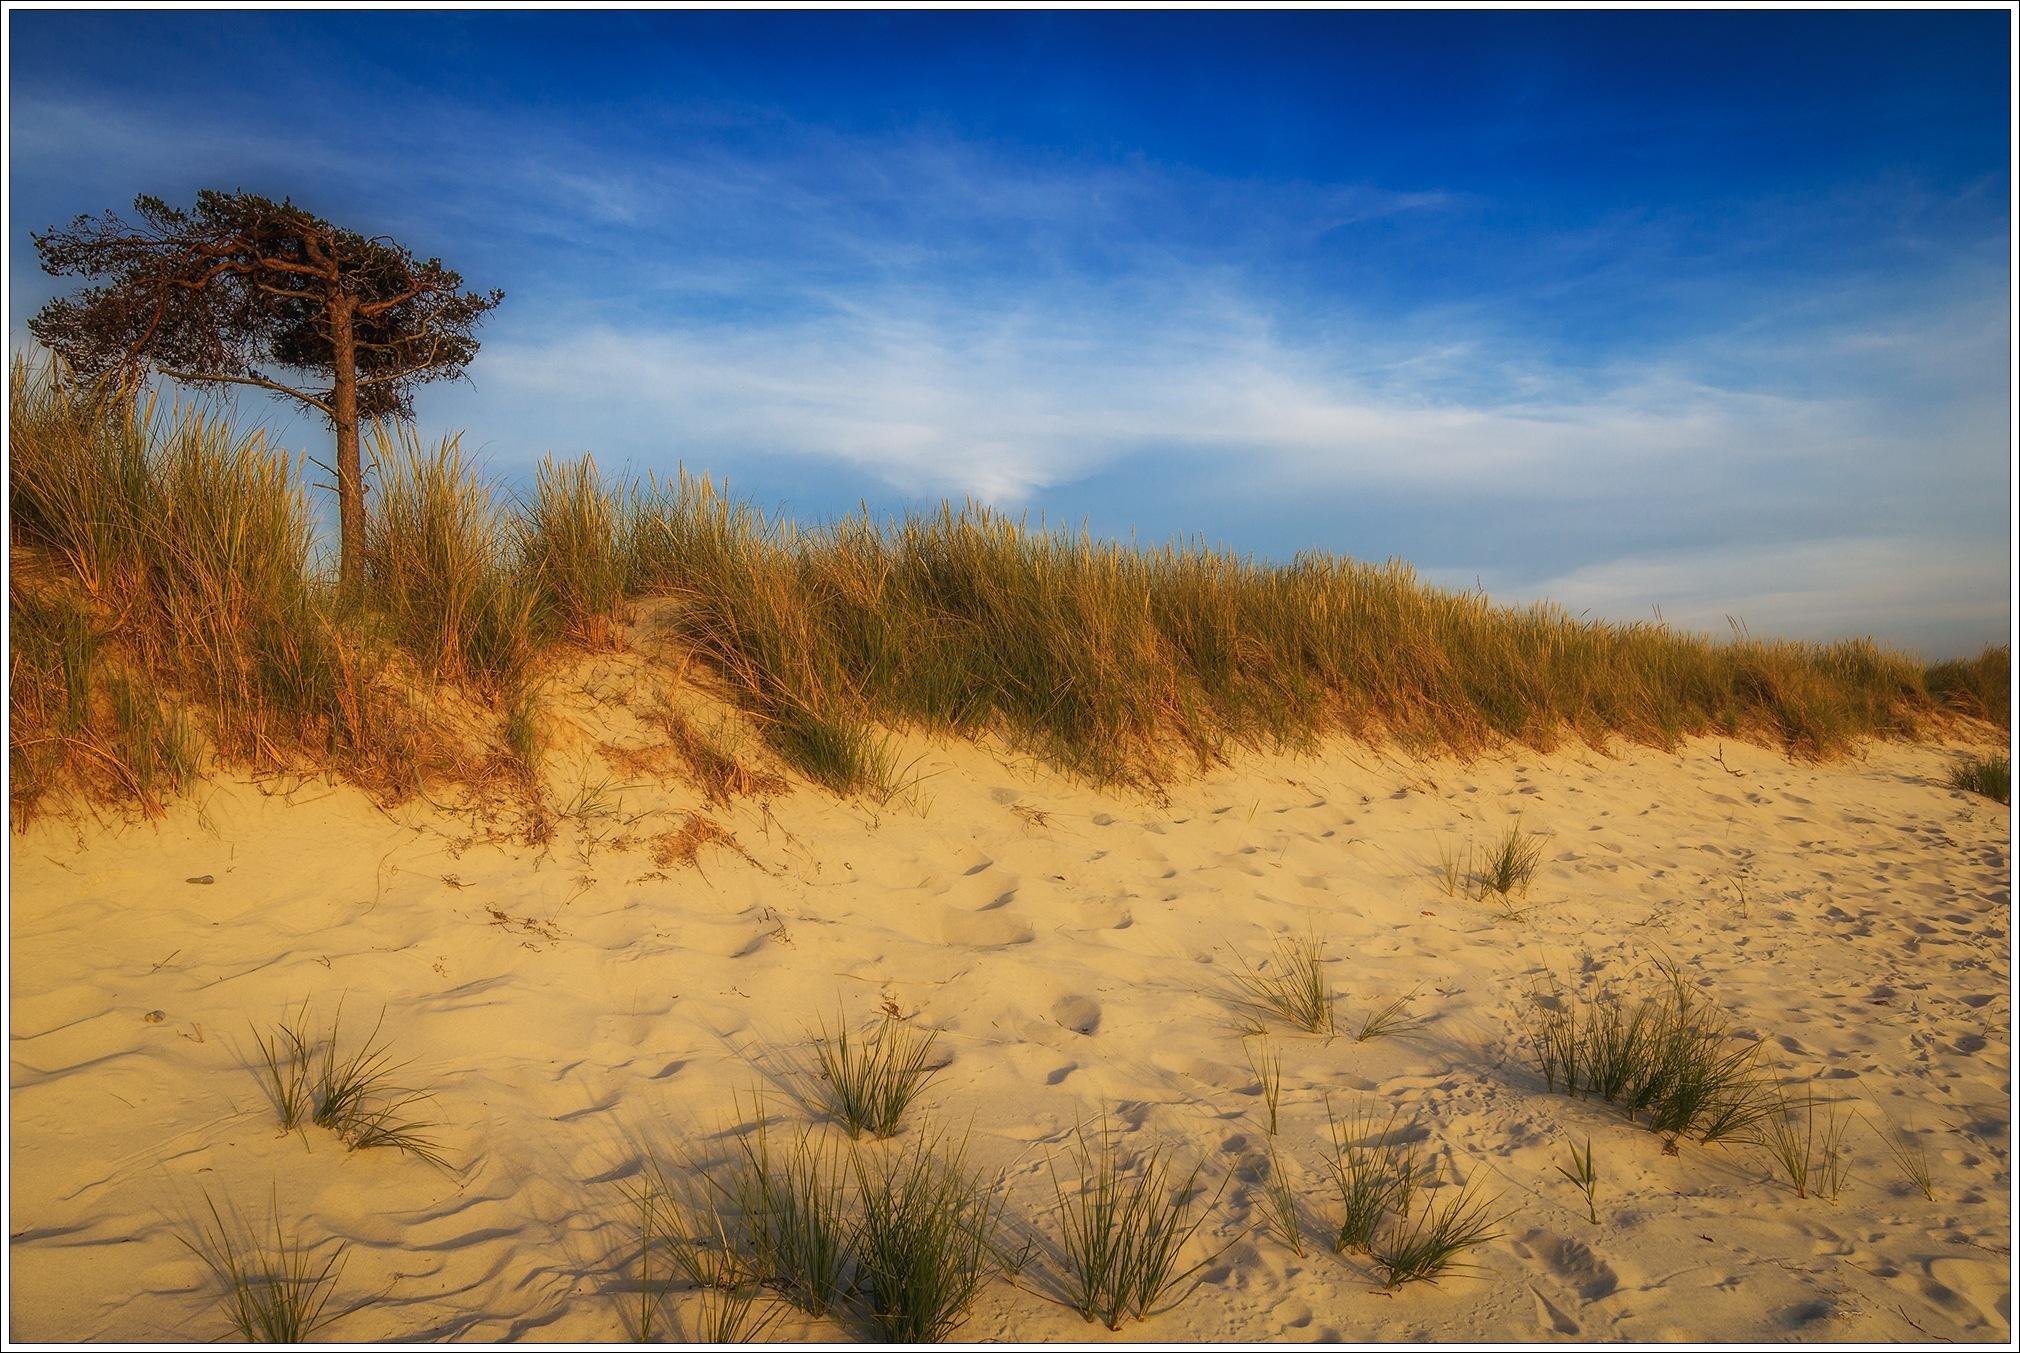 Golden light on the beach by Thomas Jahnke